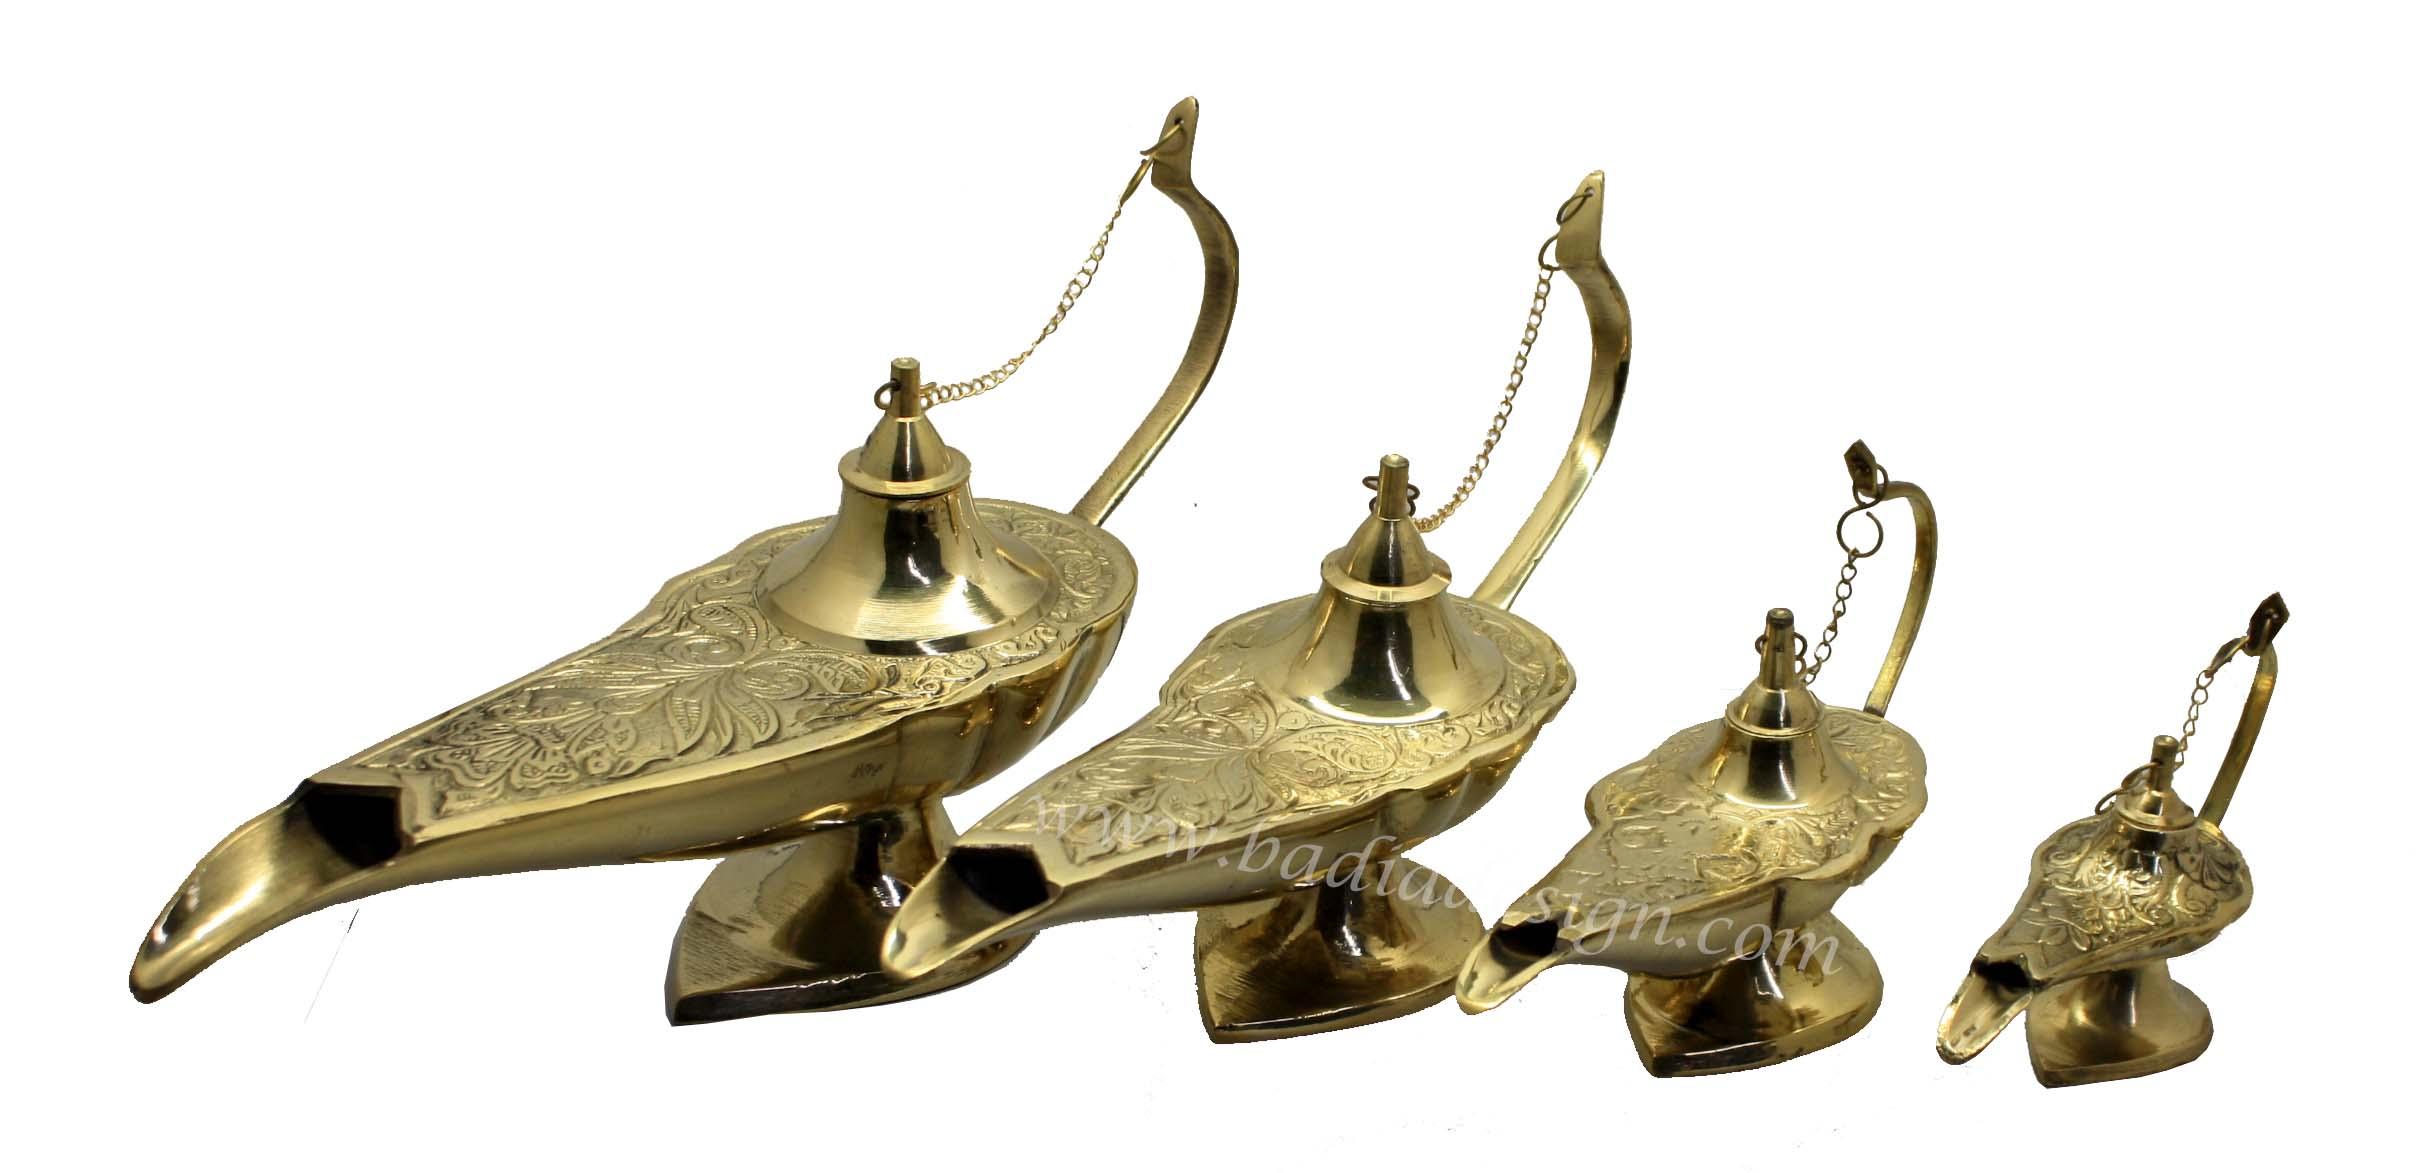 moroccan-aladdin-genie-lamp-hd174-1.jpg